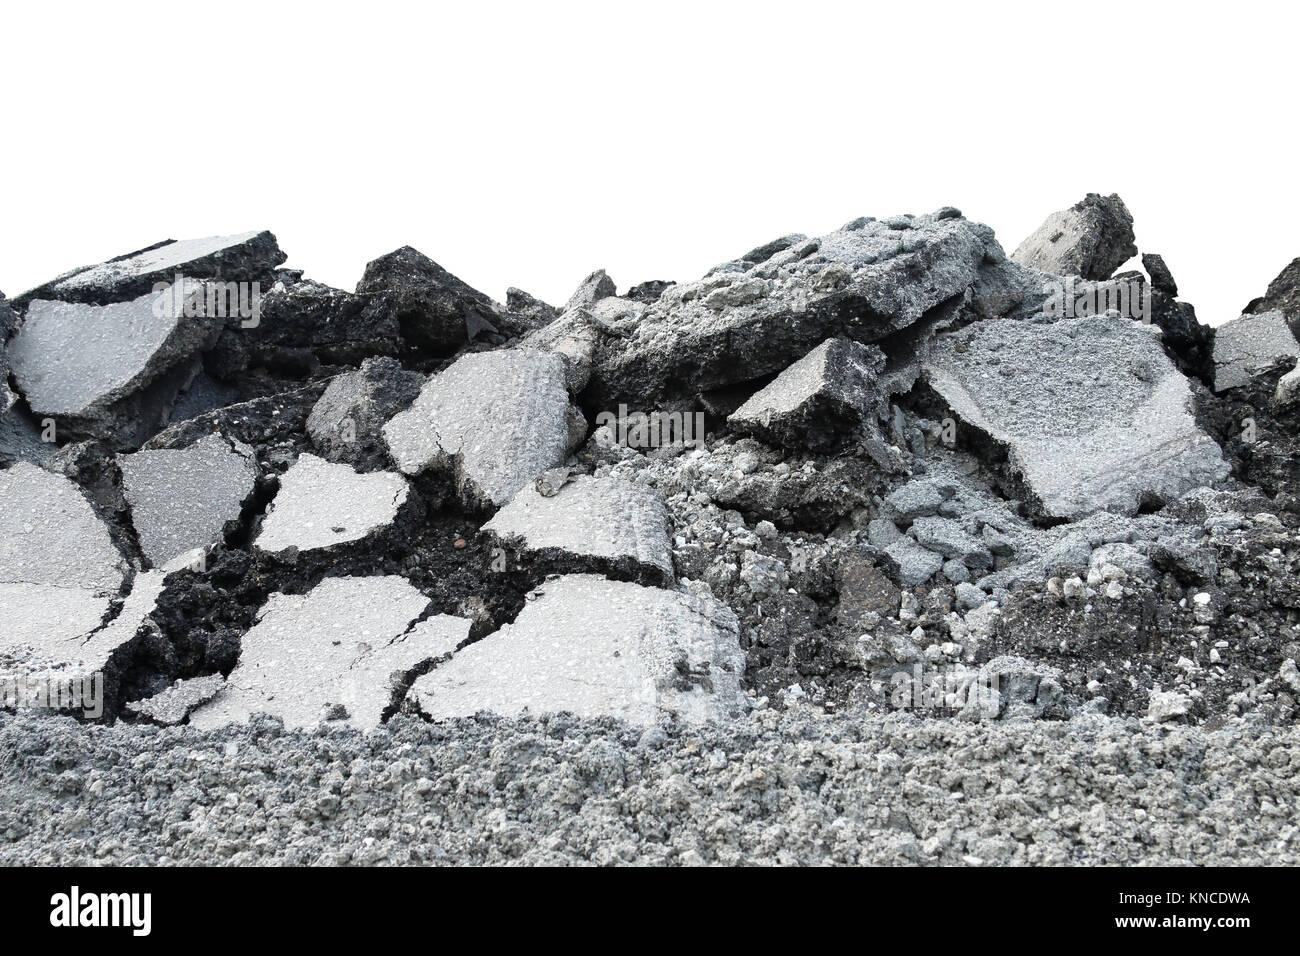 cracked ground earthquake background texture stock photos